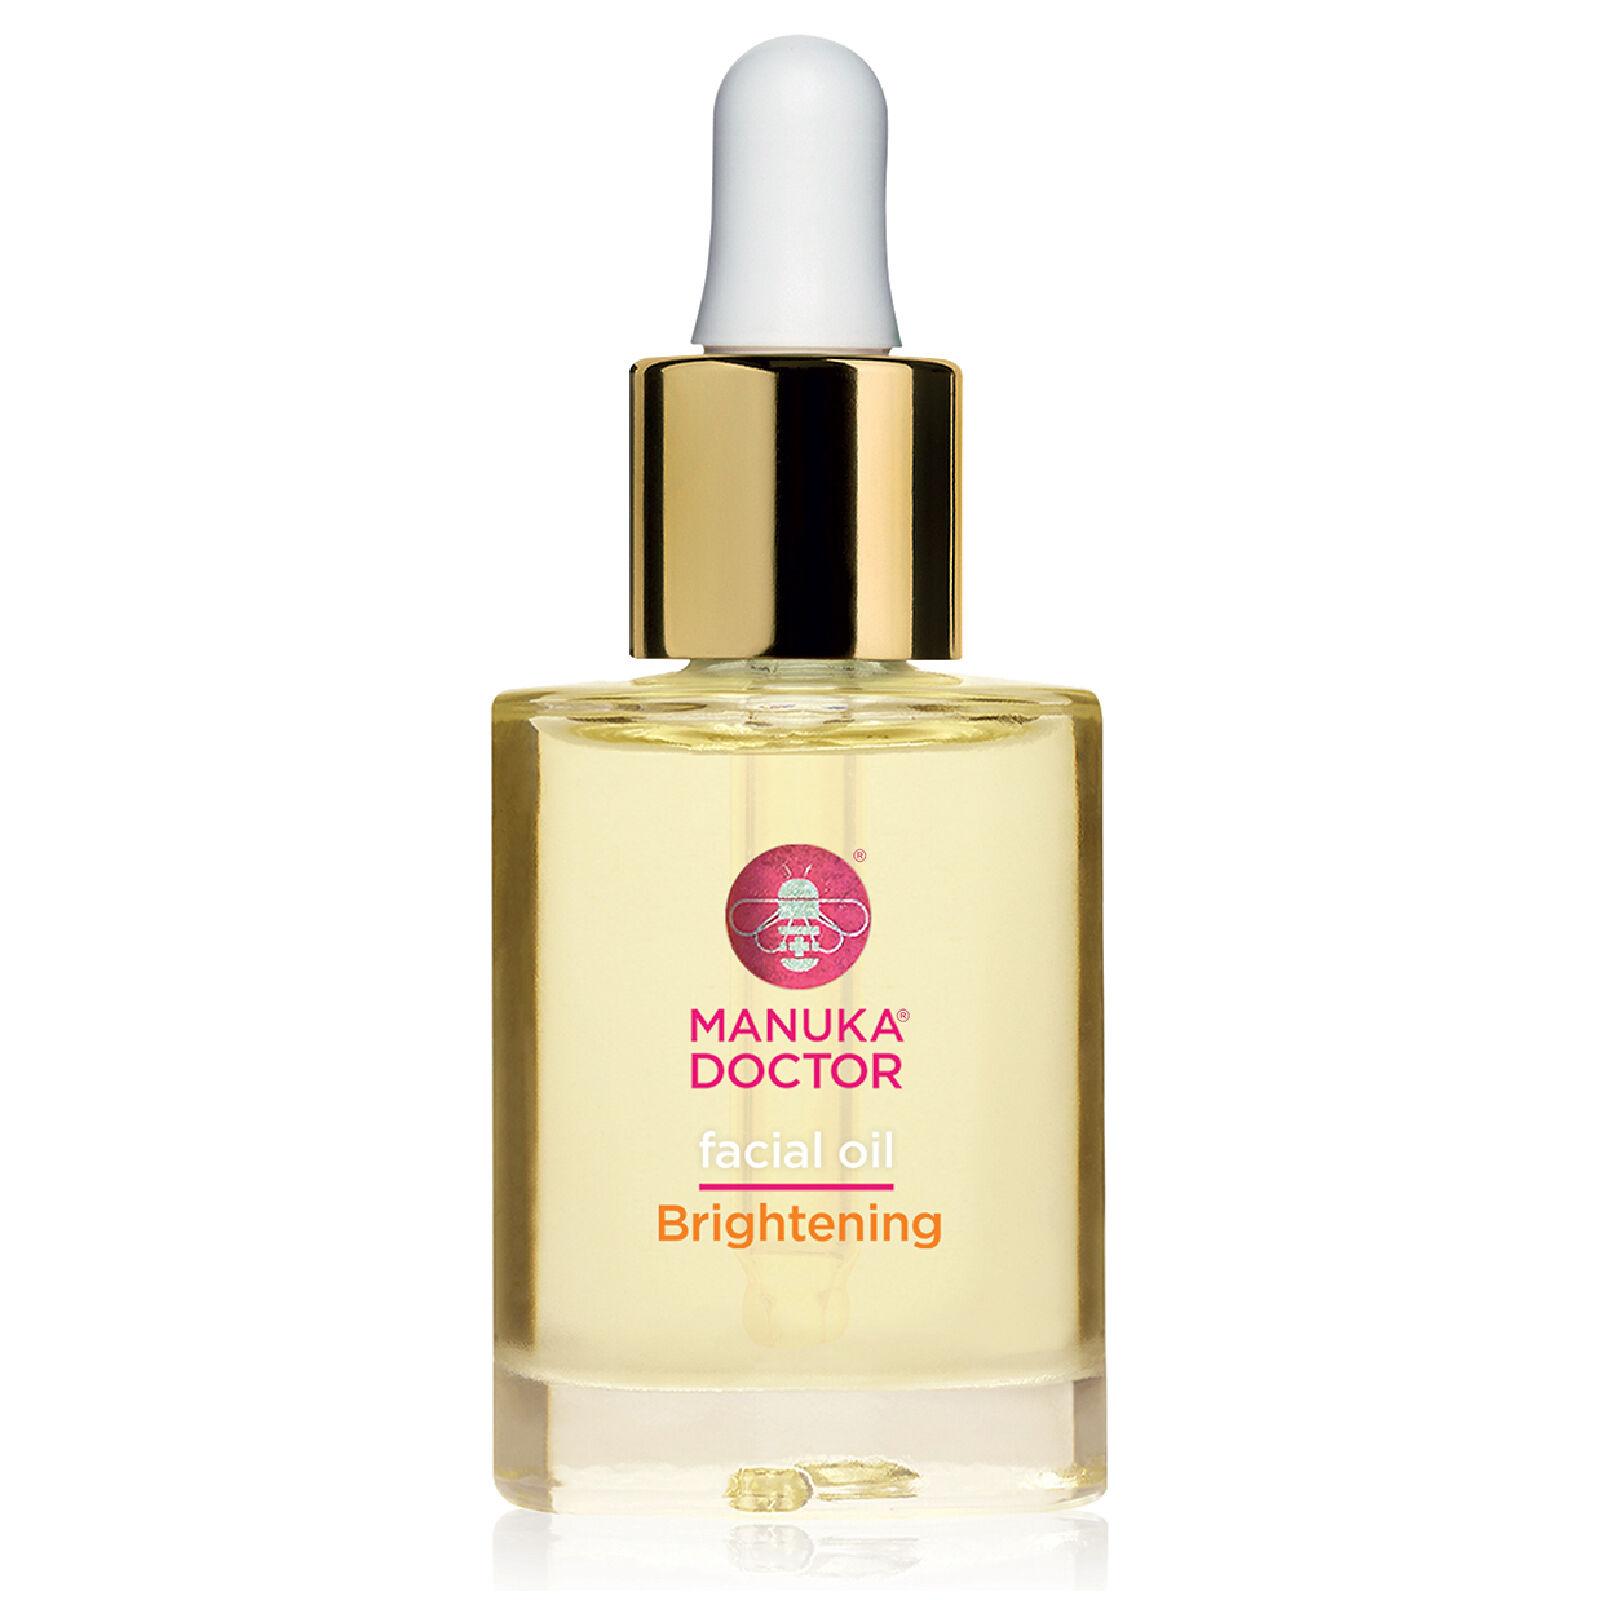 Manuka Doctor Huile Visage Éclaircissante Brightening Facial Oil Manuka Doctor 25 ml